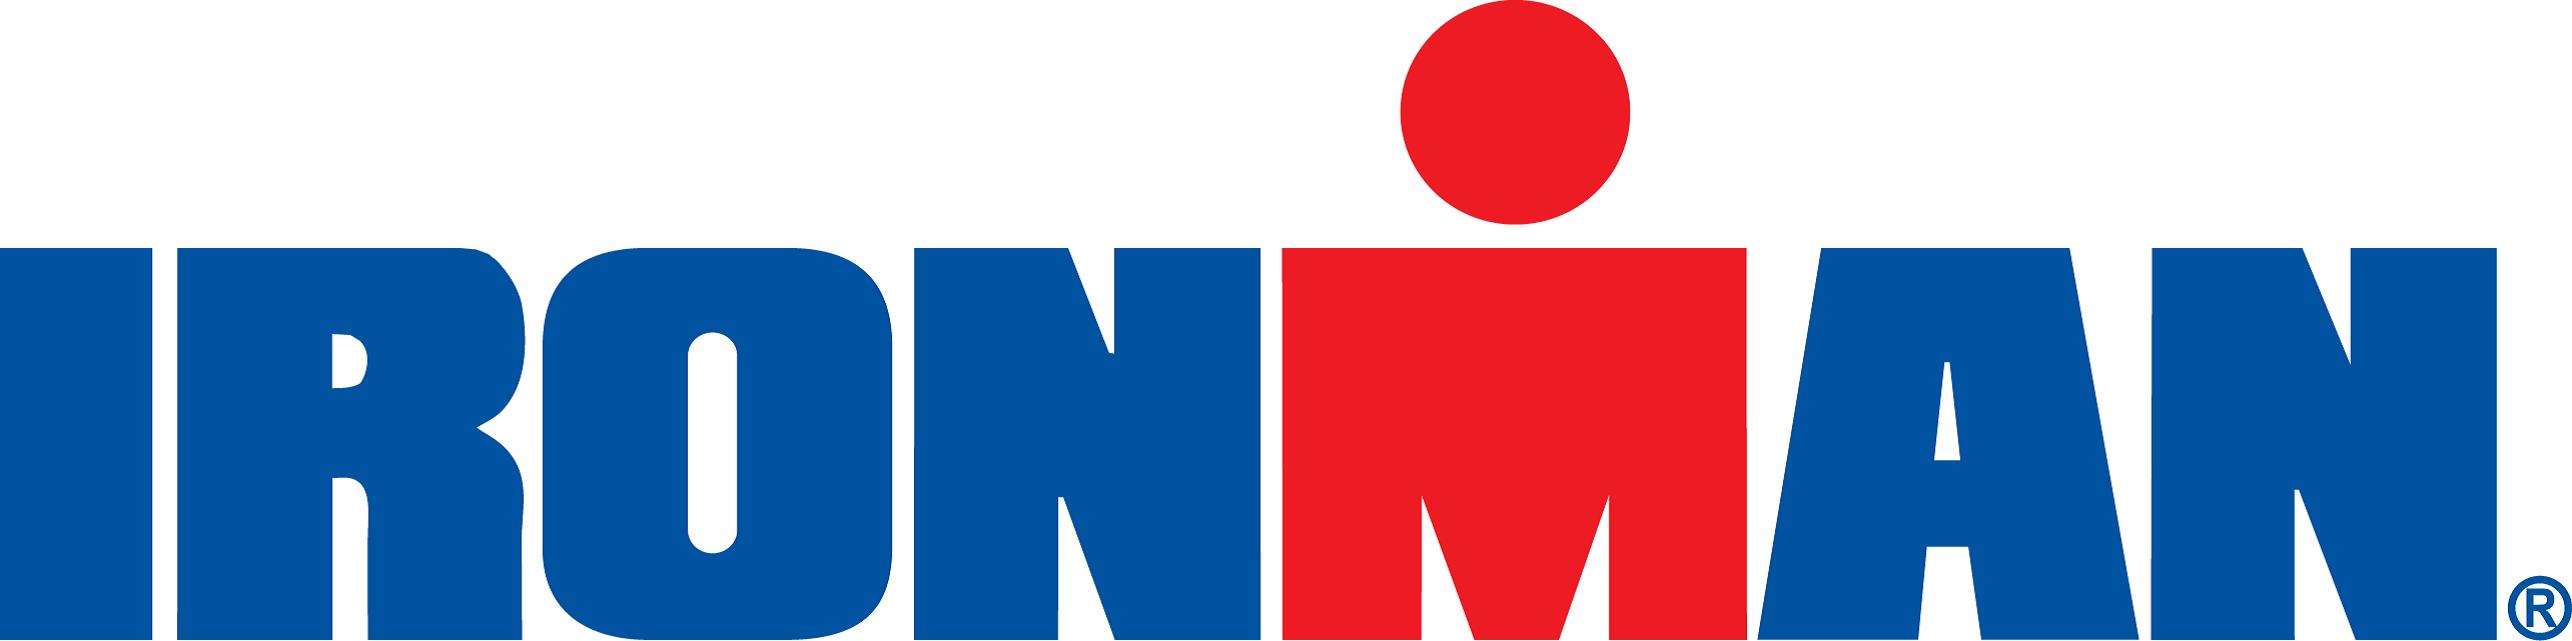 2572x641 IRONMAN logo – Crossfit Springfield Endurance